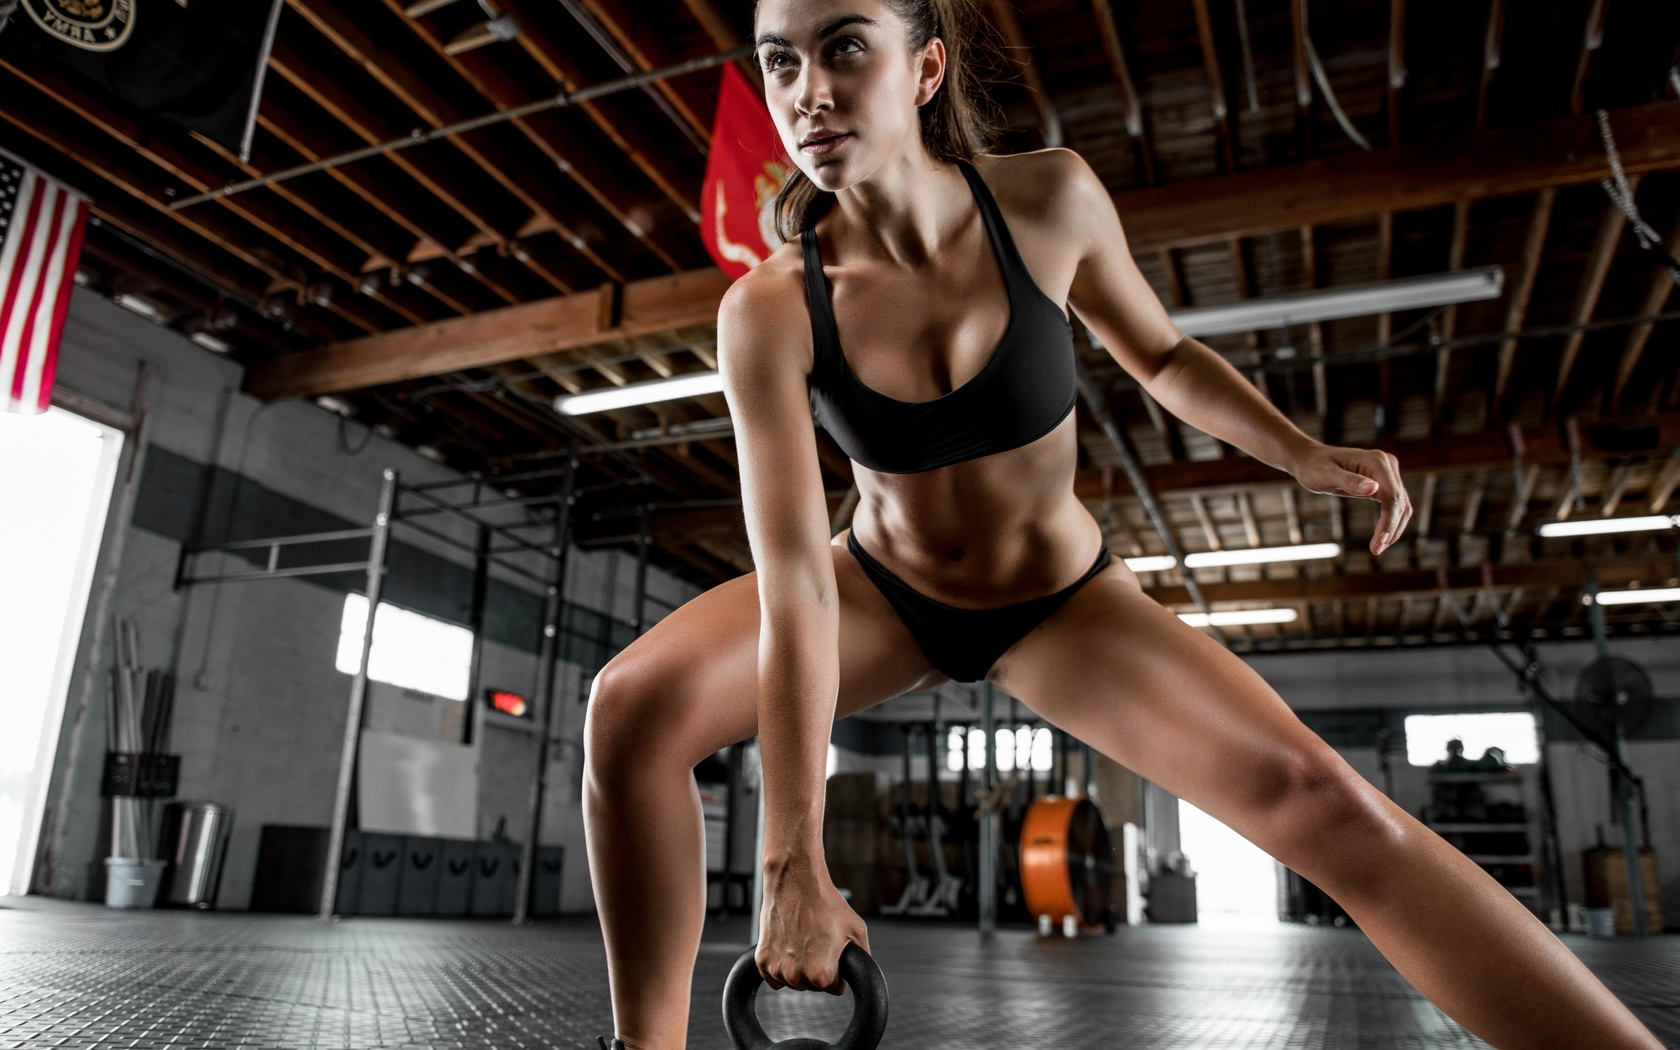 видео девушки и спорт бляди